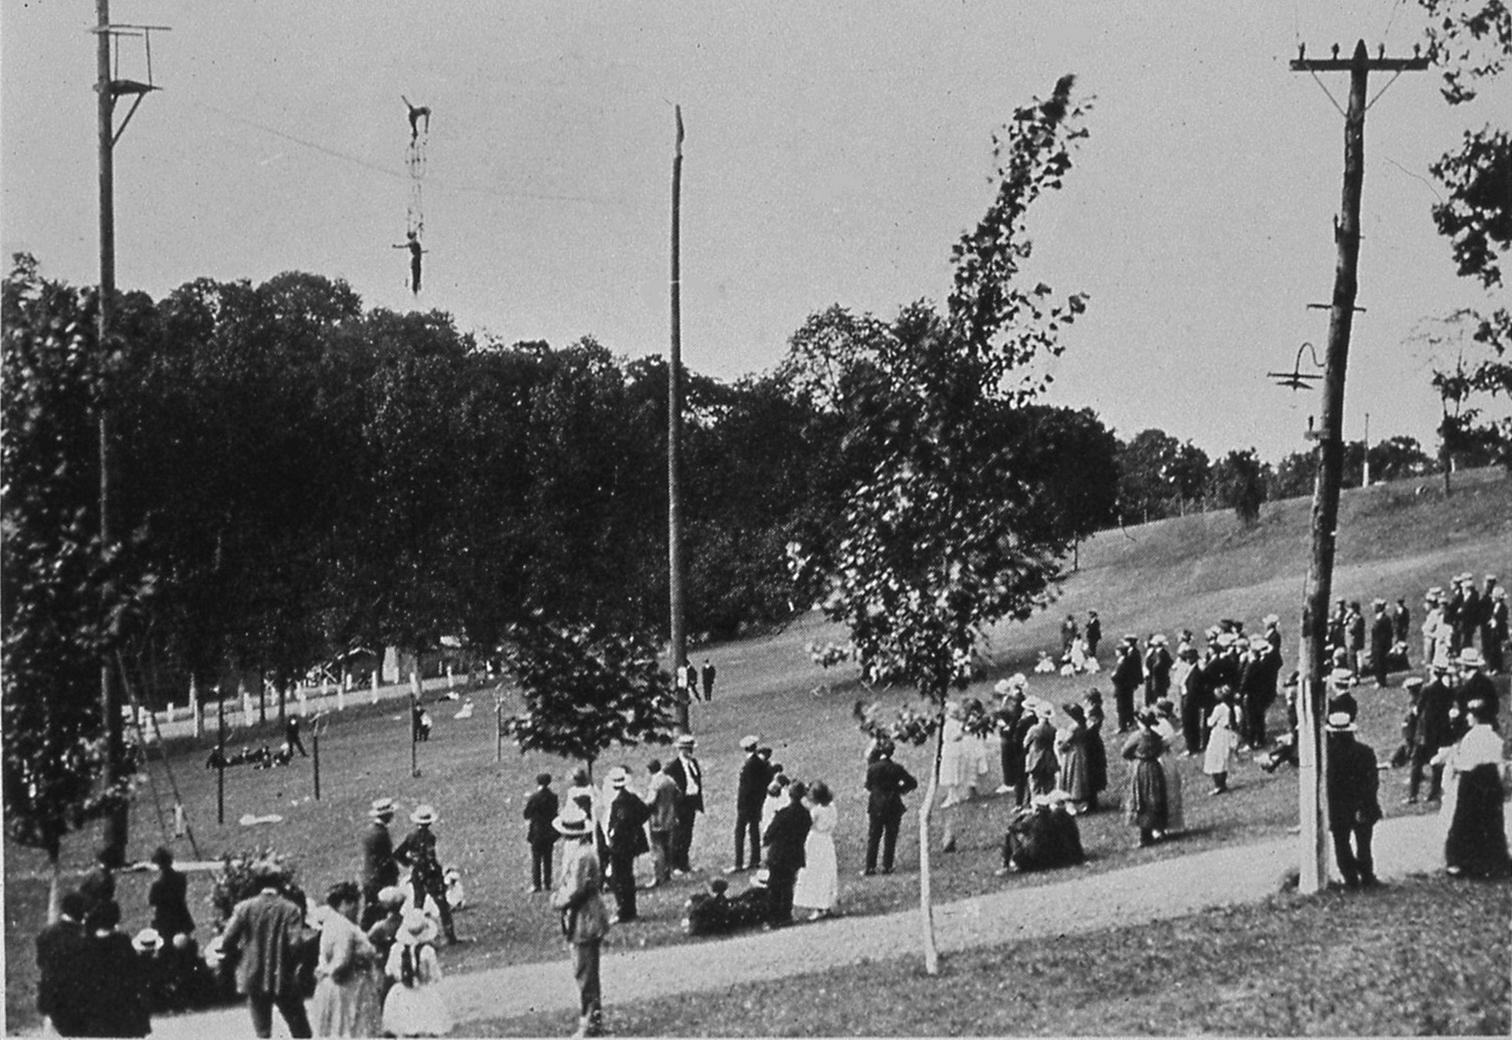 SANATOGA PARK | LOWER POTTSGROVE HISTORICAL SOCIETY